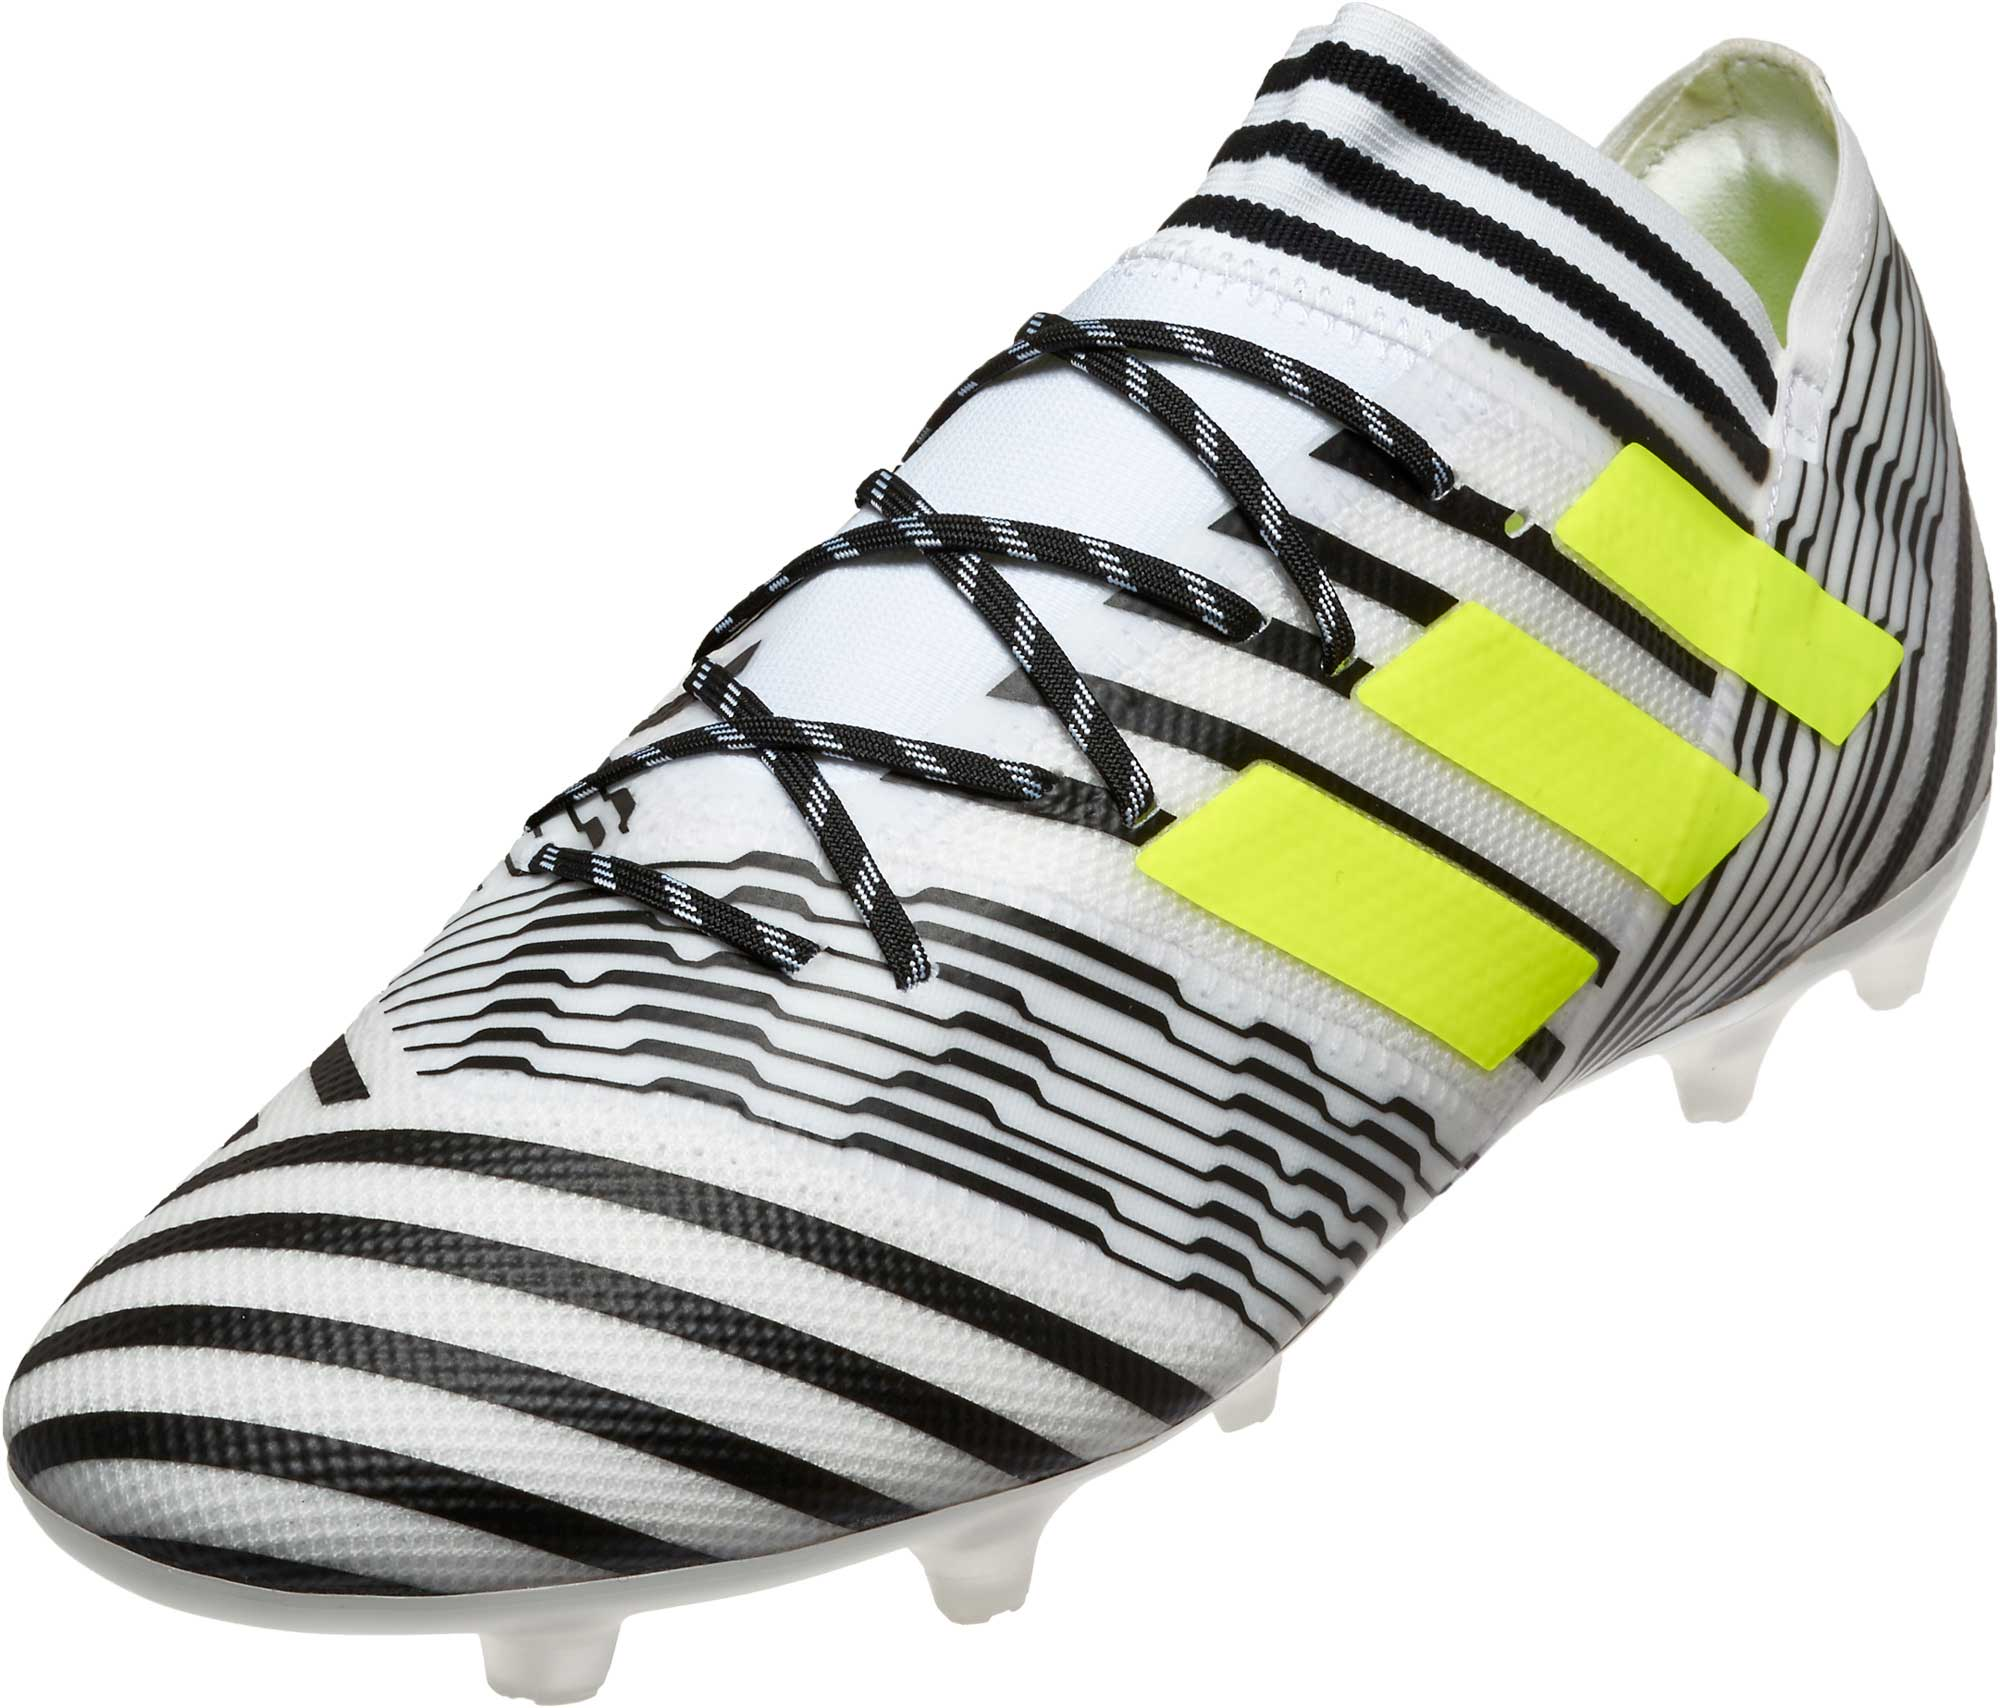 91314f39c61c adidas Nemeziz 17.2 FG Soccer Cleats - White   Solar Yellow ...